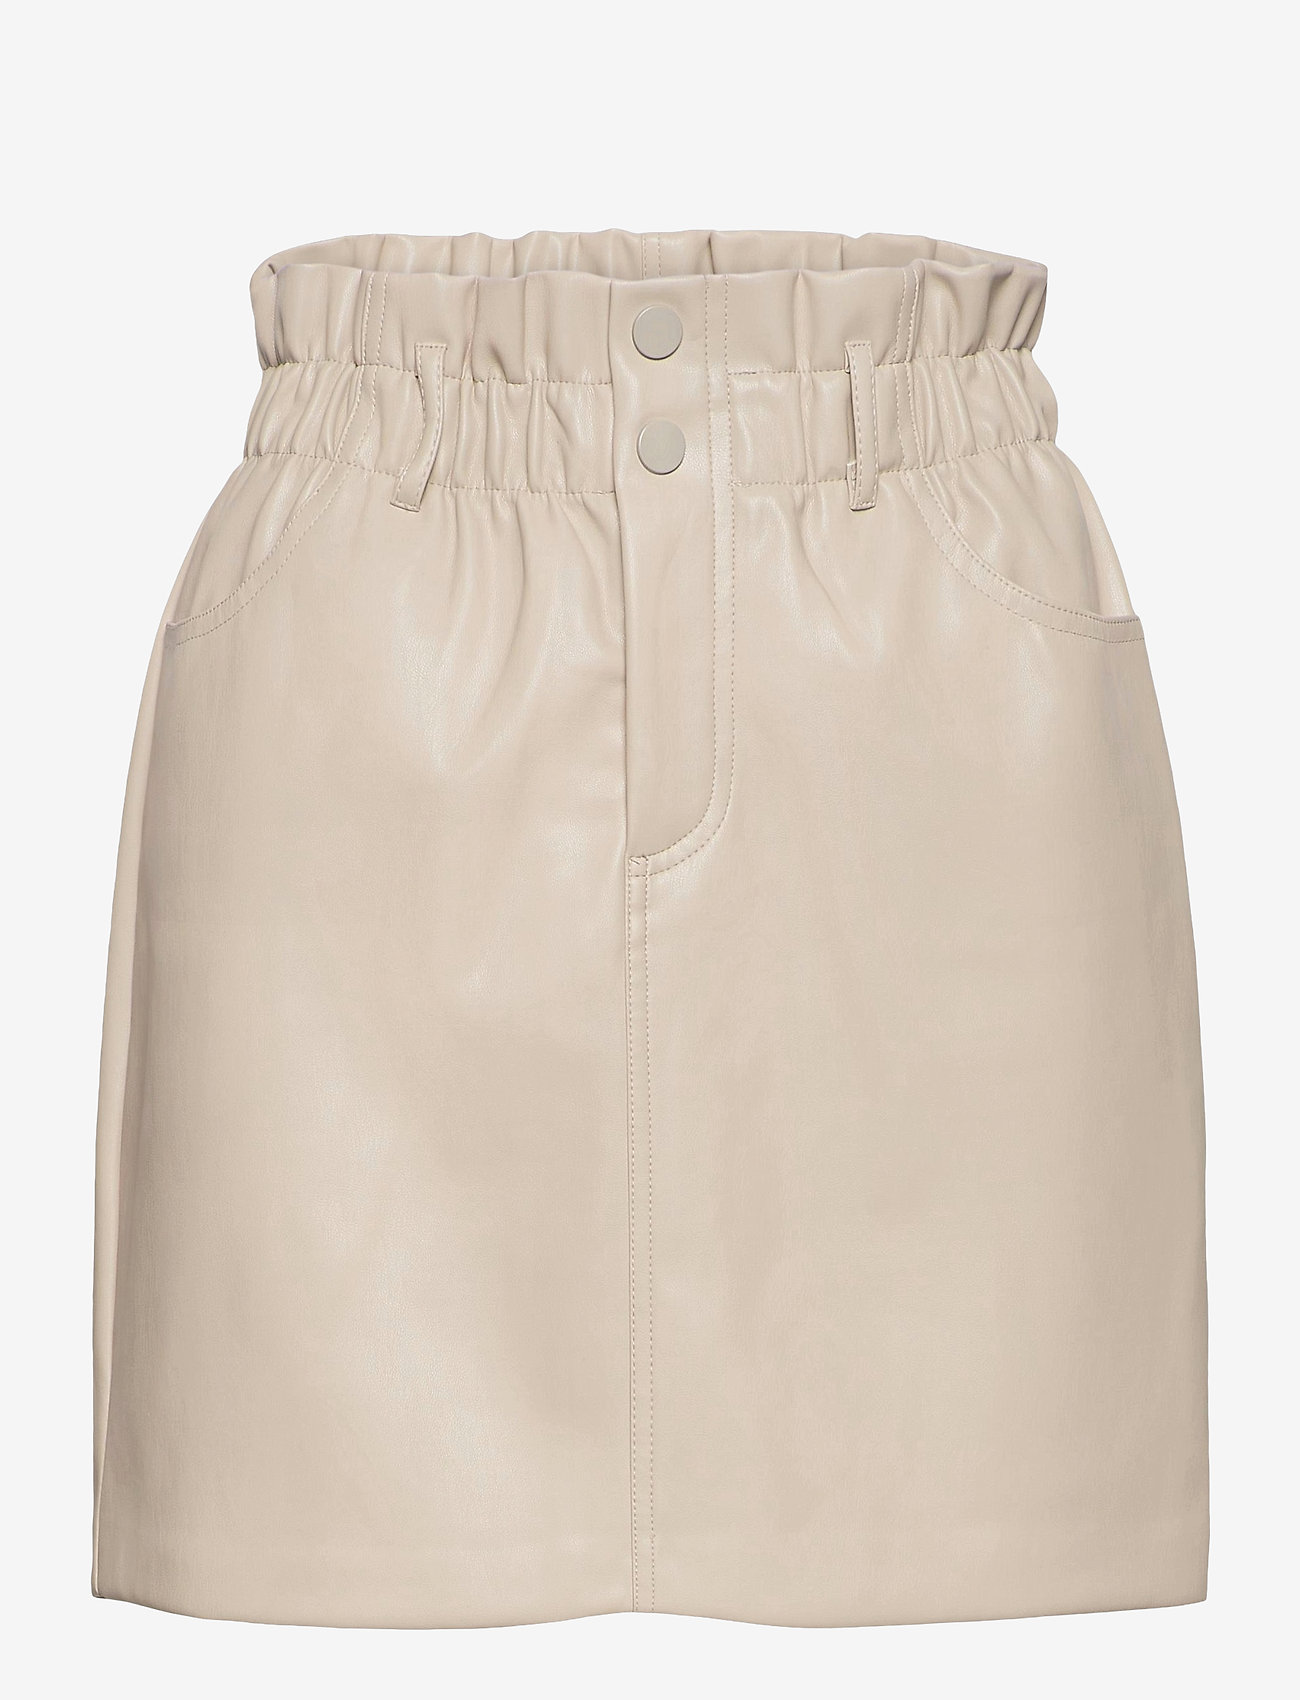 ONLY - ONLMILLIE-MIRI PB FAUX LEATHER SKIRT PNT - korta kjolar - pumice stone - 0